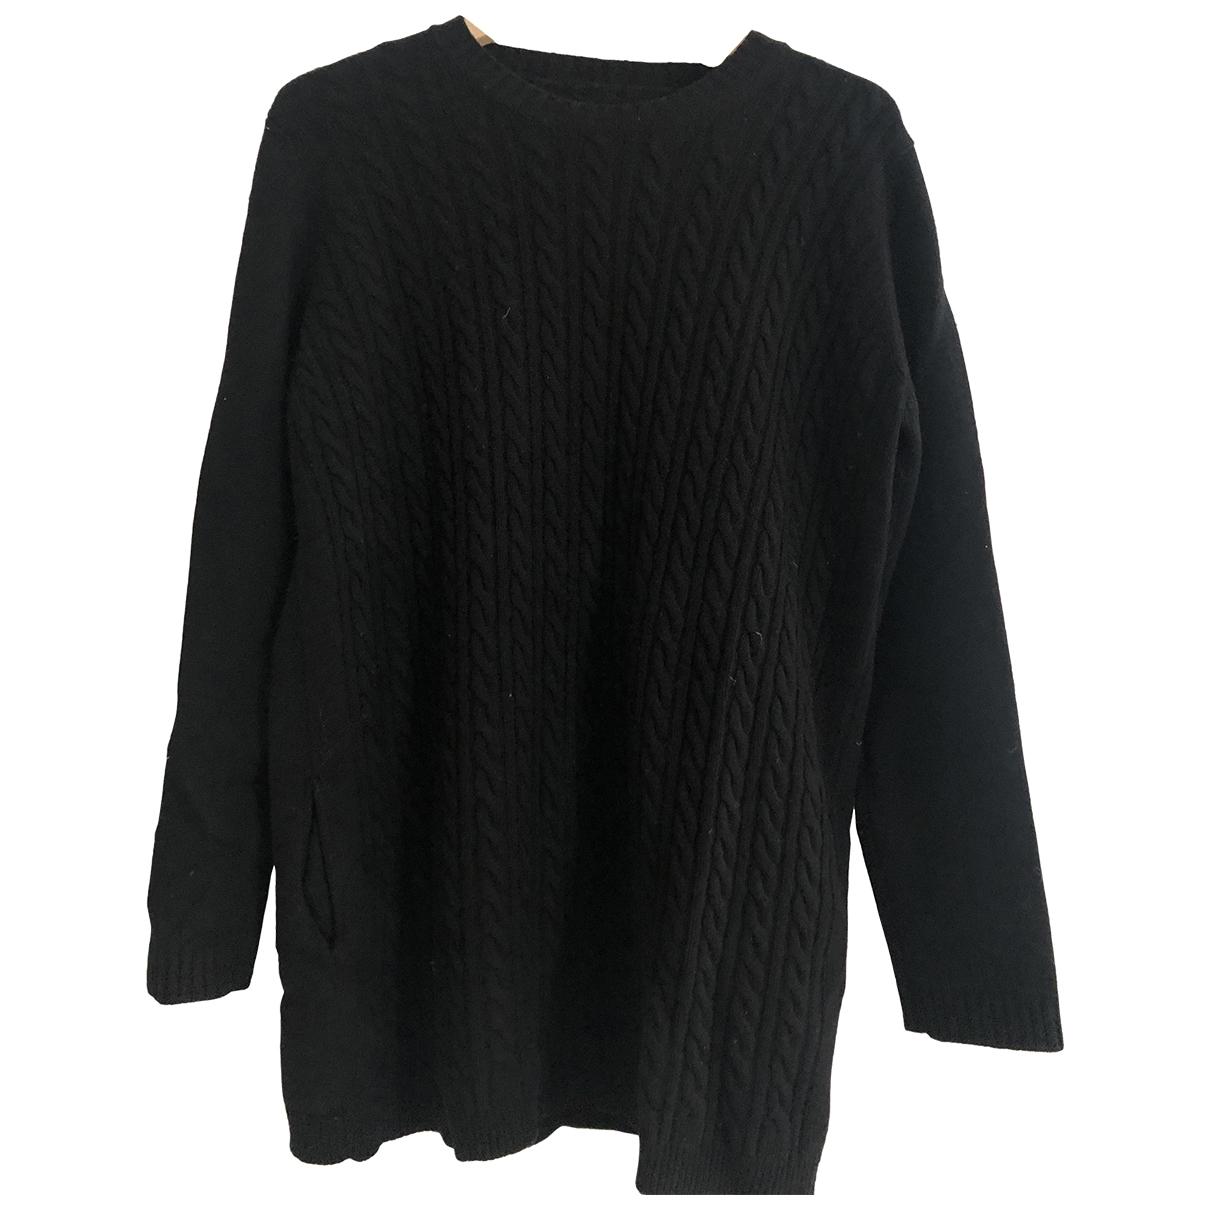 Valentino Garavani \N Black Wool Knitwear for Women L International